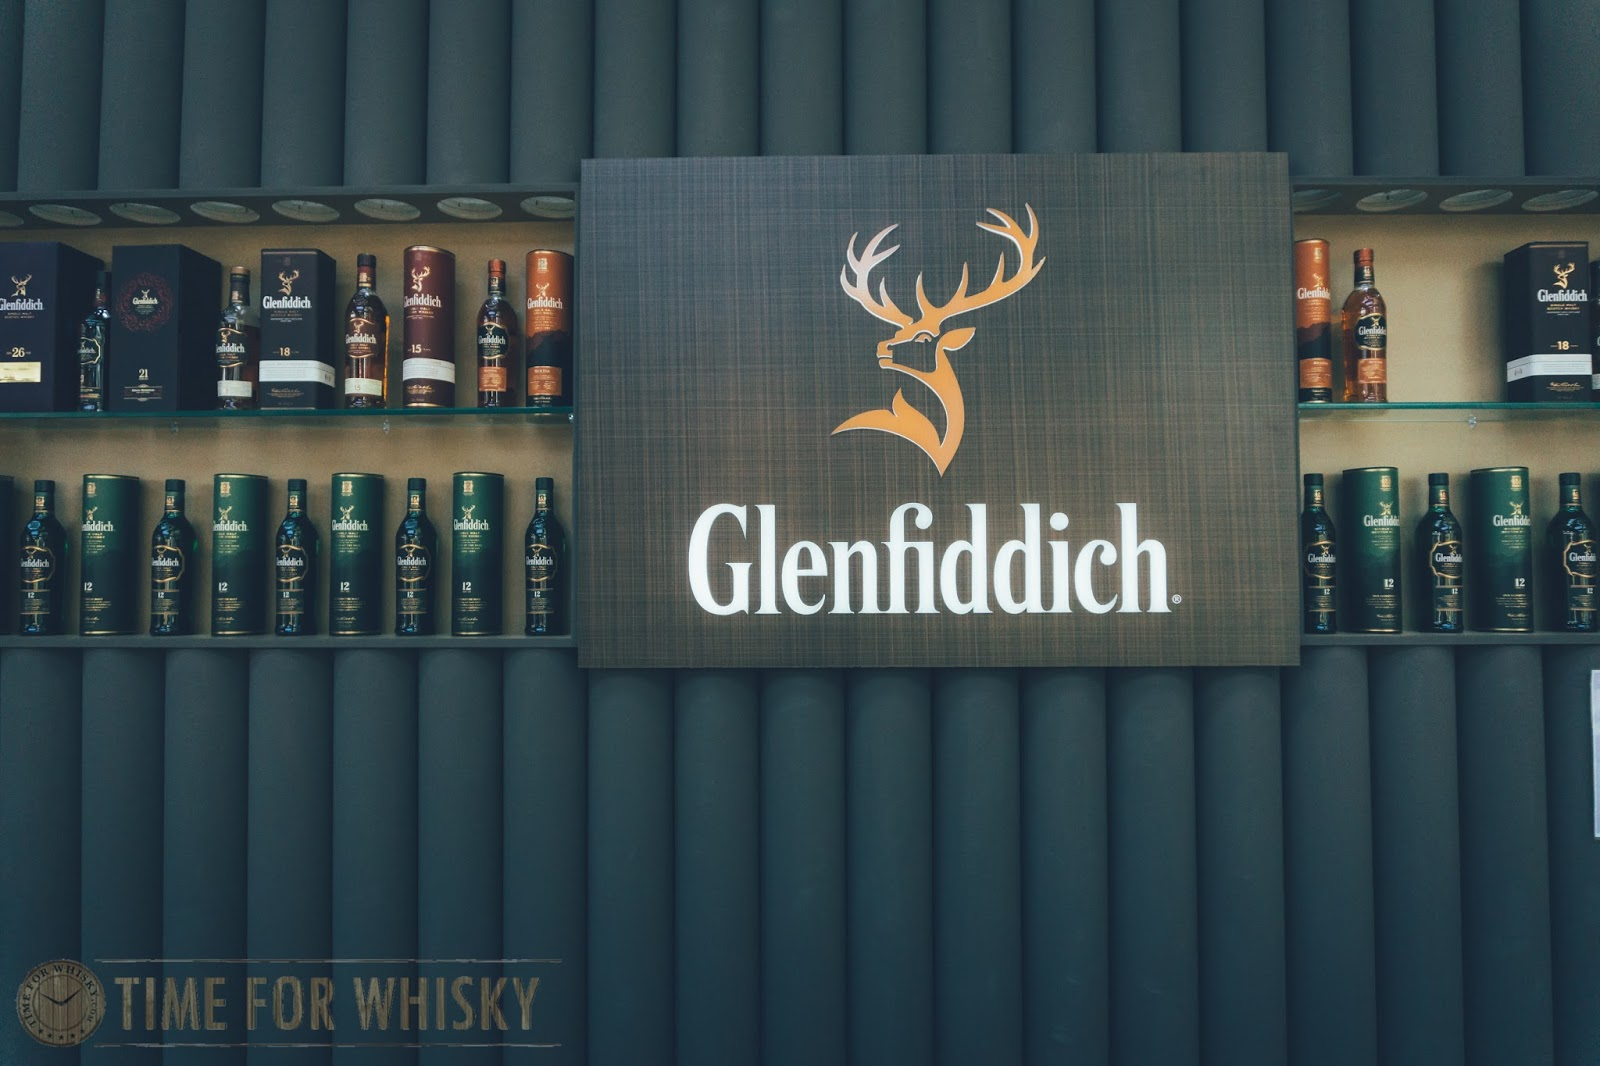 Glenfiddich Distillery Artist In Residency 2019 Edition